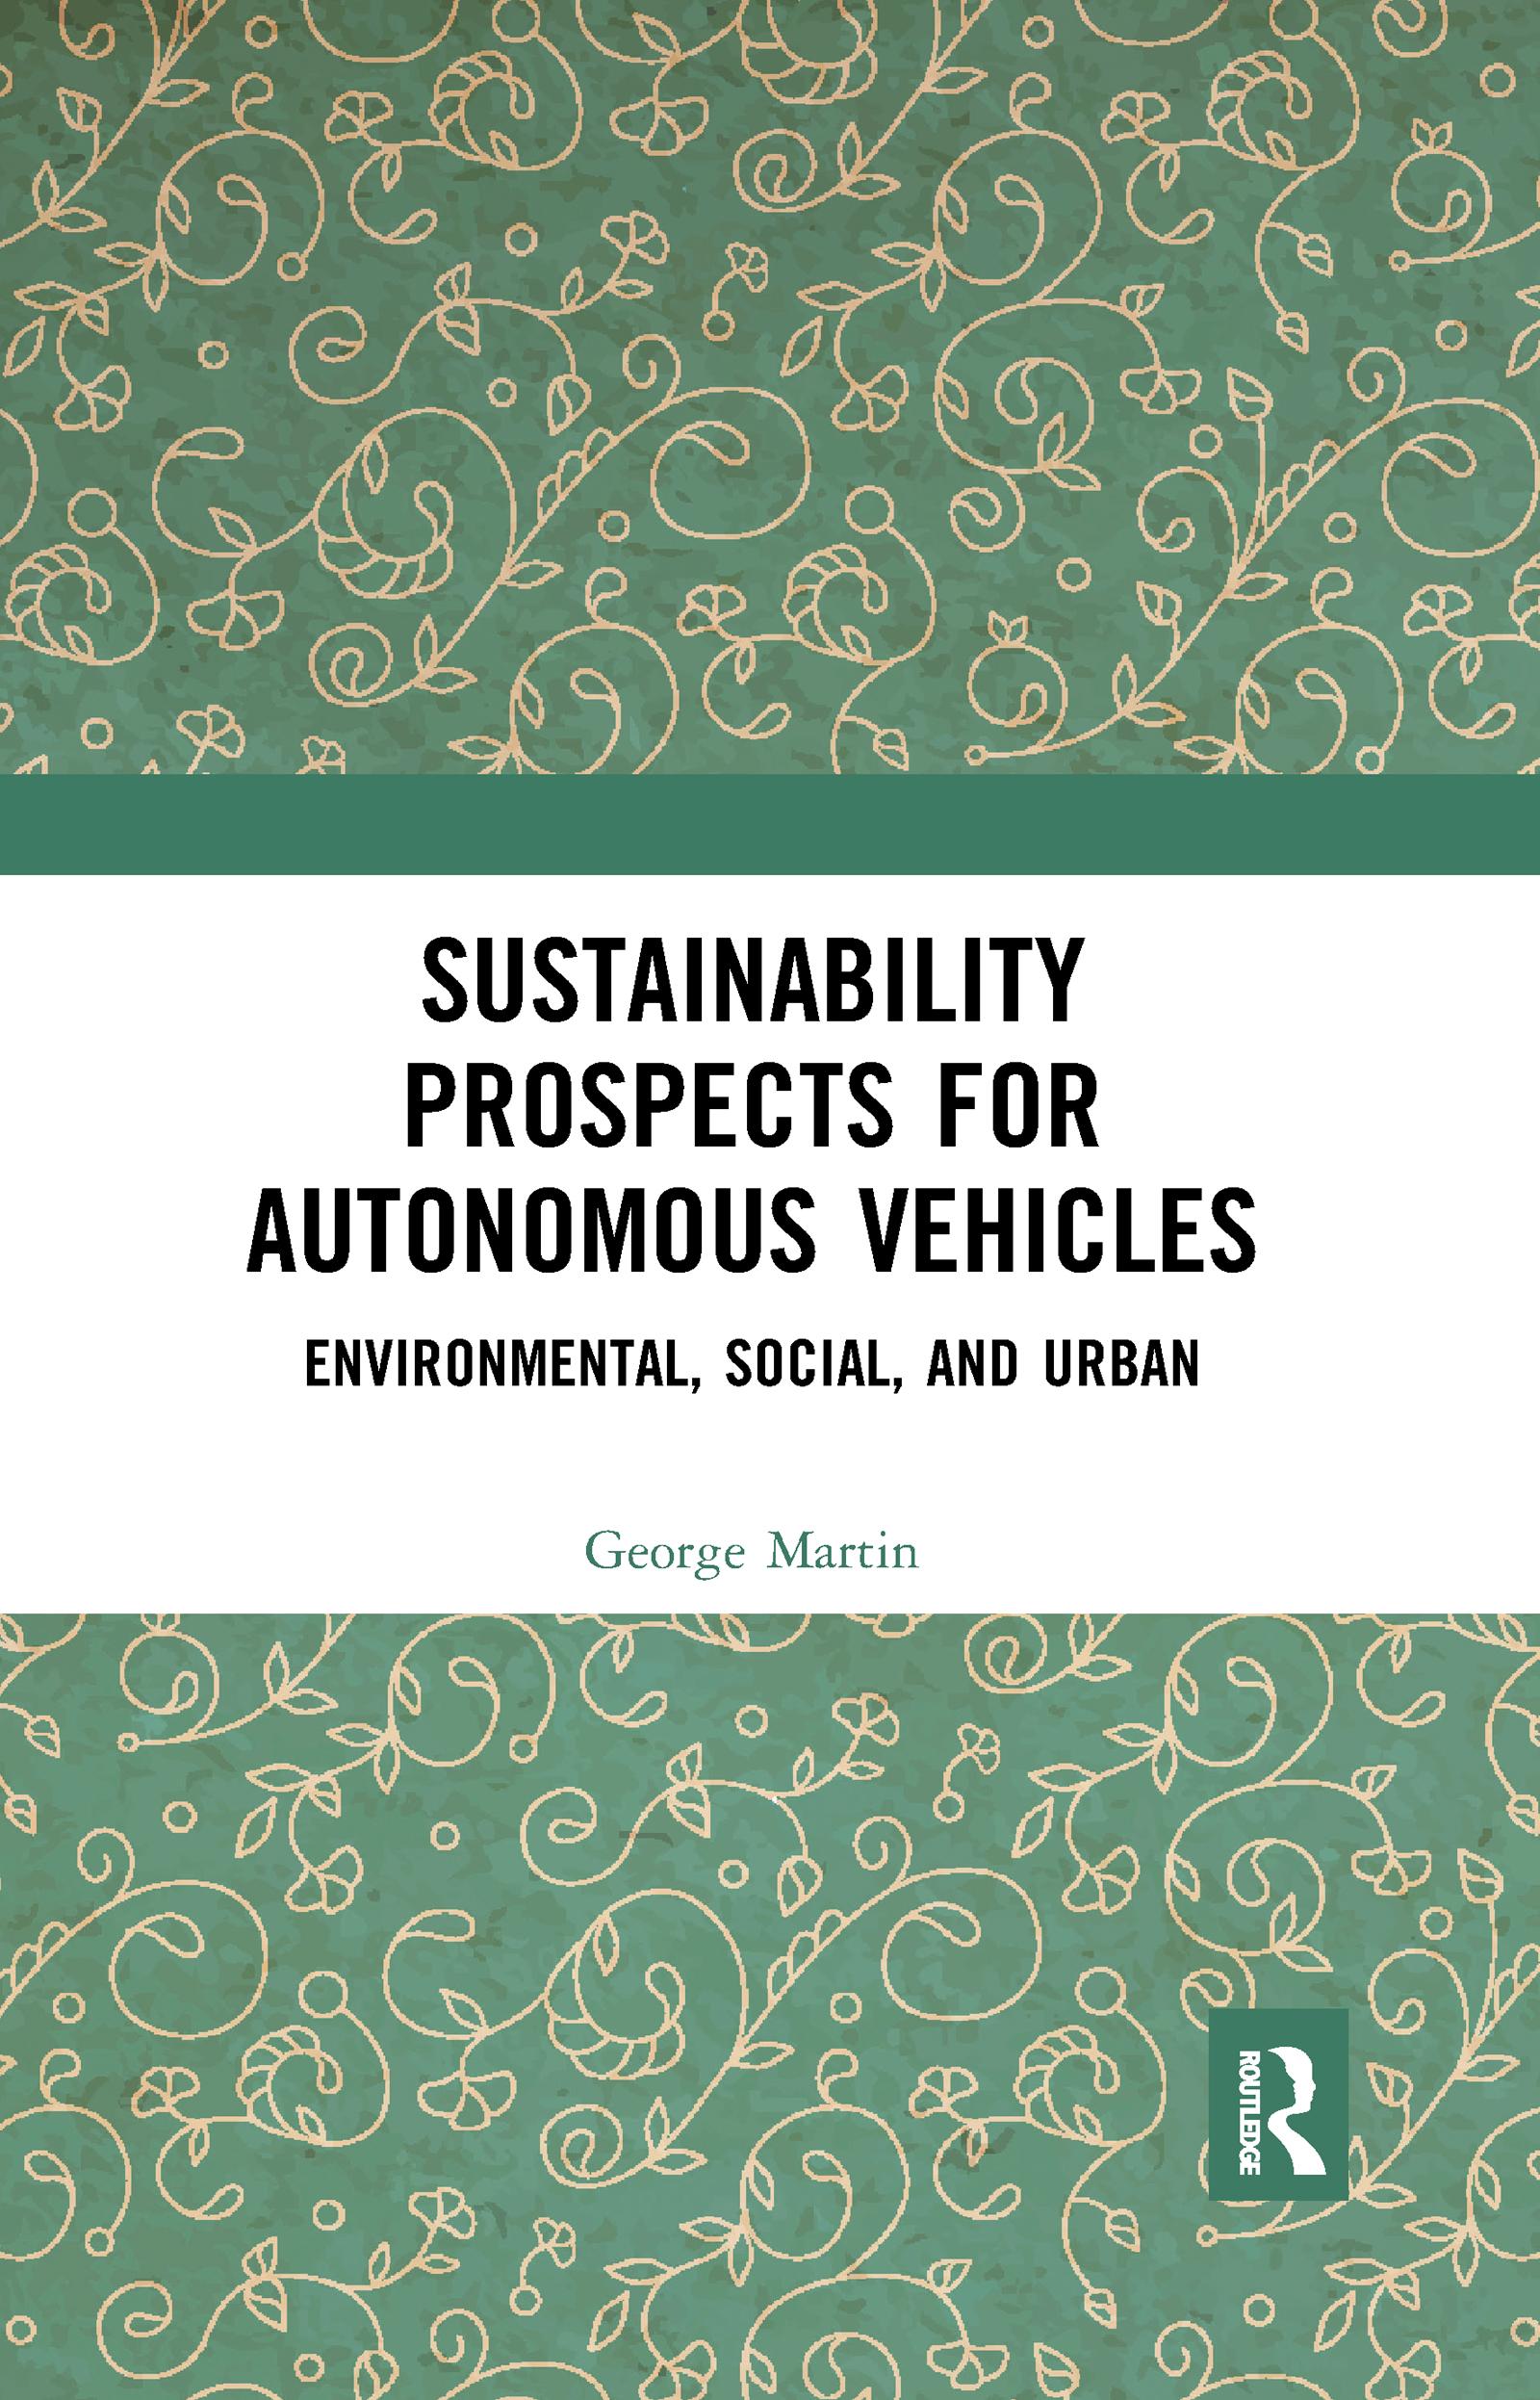 Sustainability Prospects for Autonomous Vehicles